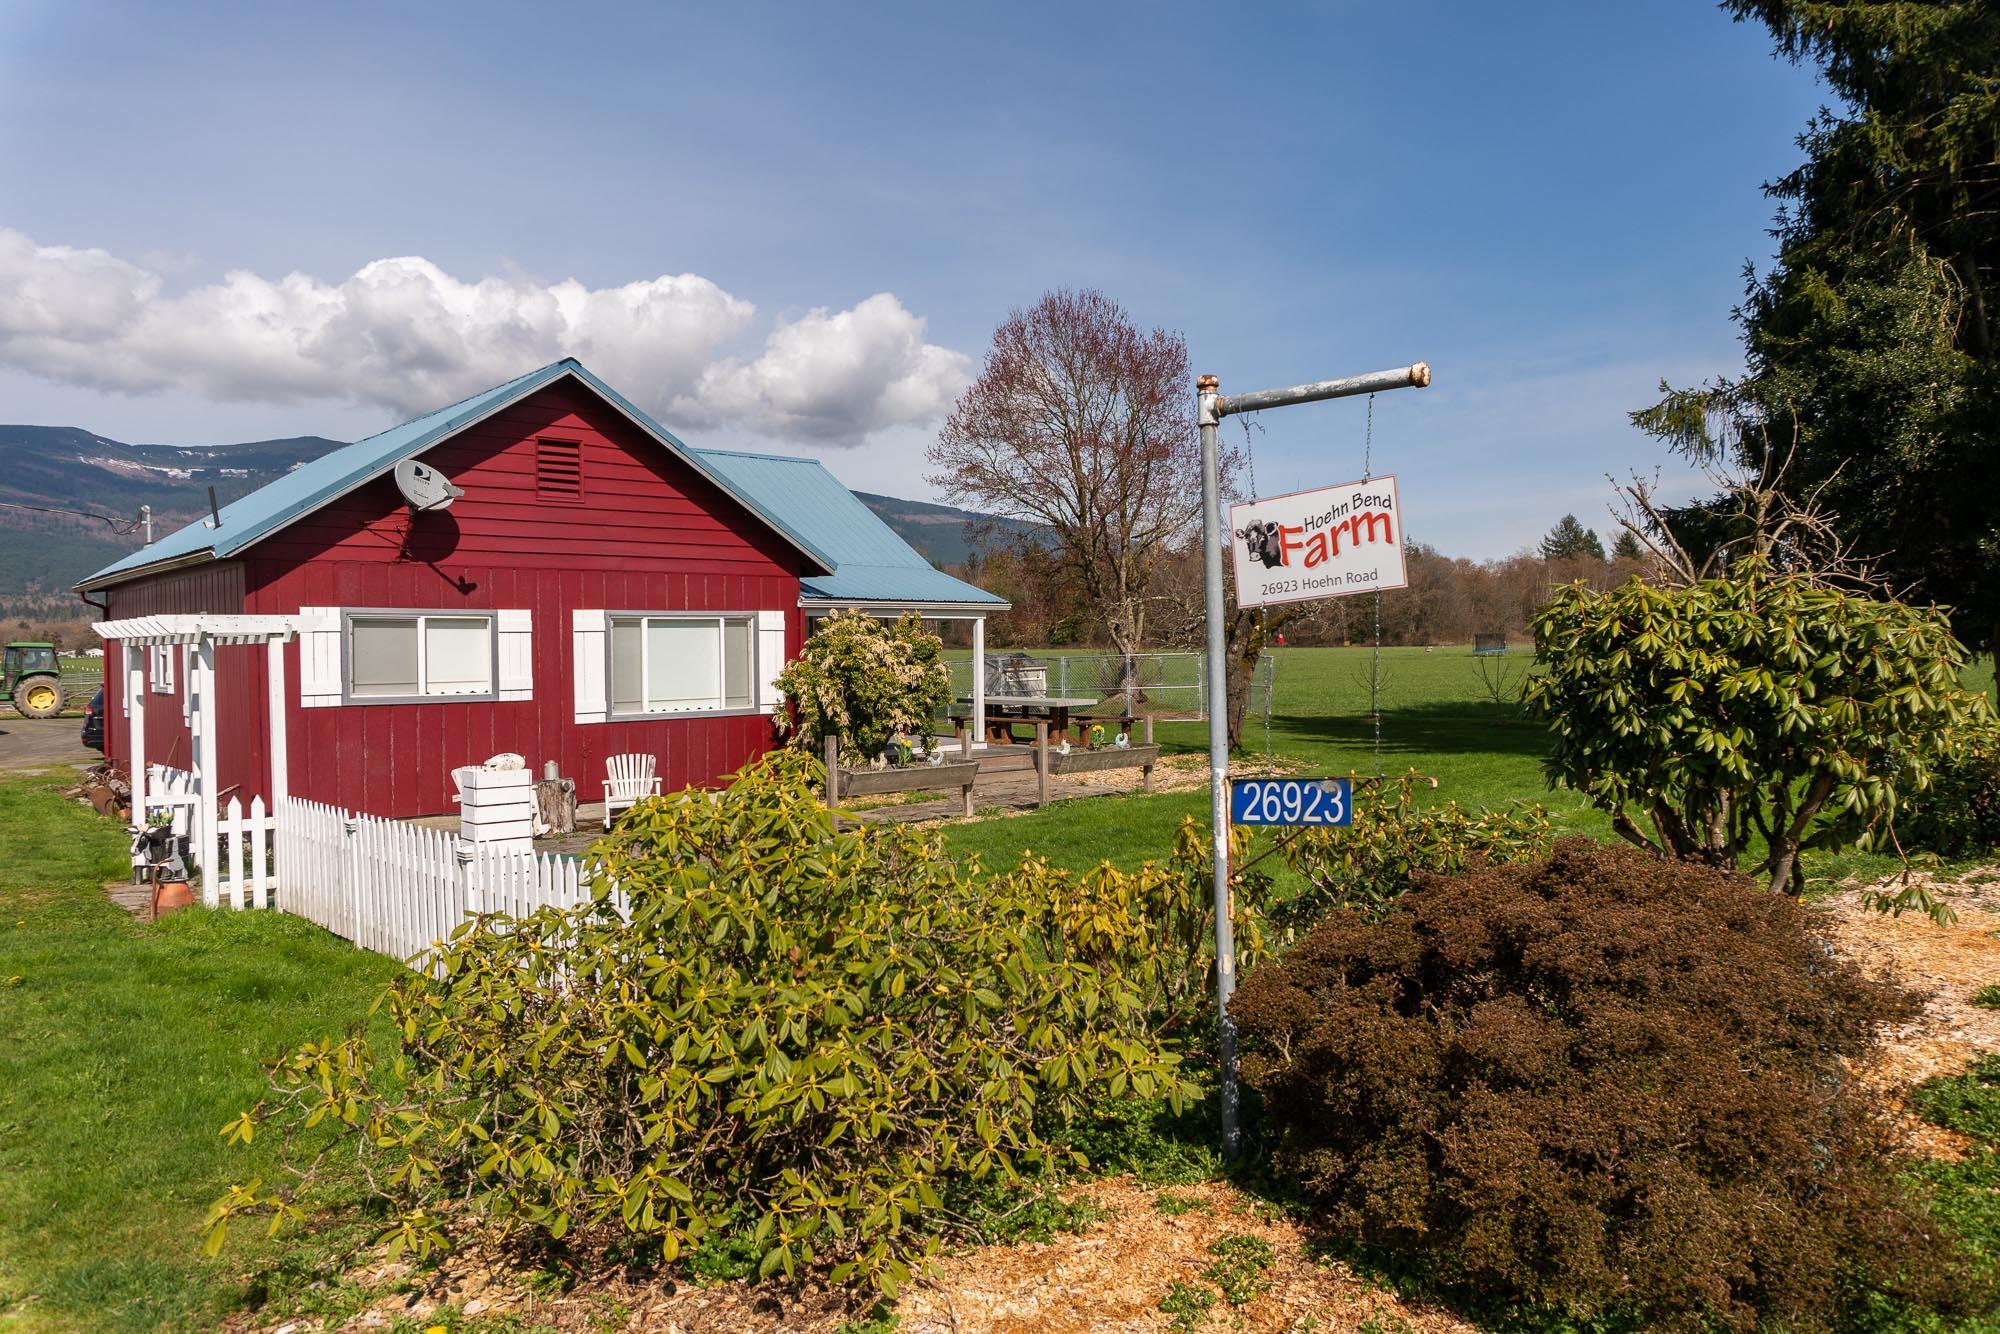 Pratt_Hoehn Bend Farm_015.jpg